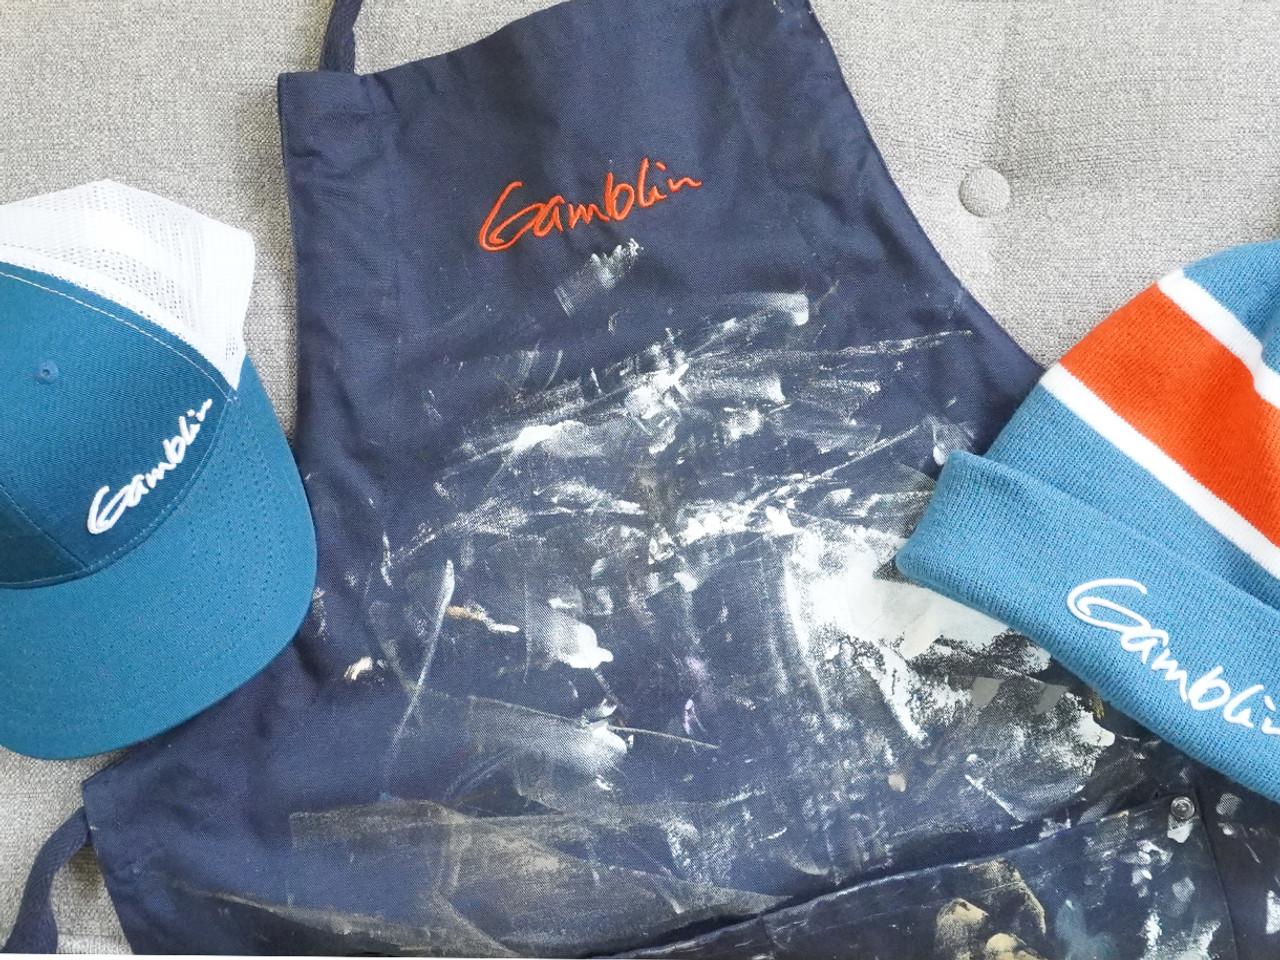 Gamblin blue meshback cap, apron, and pompom beanie